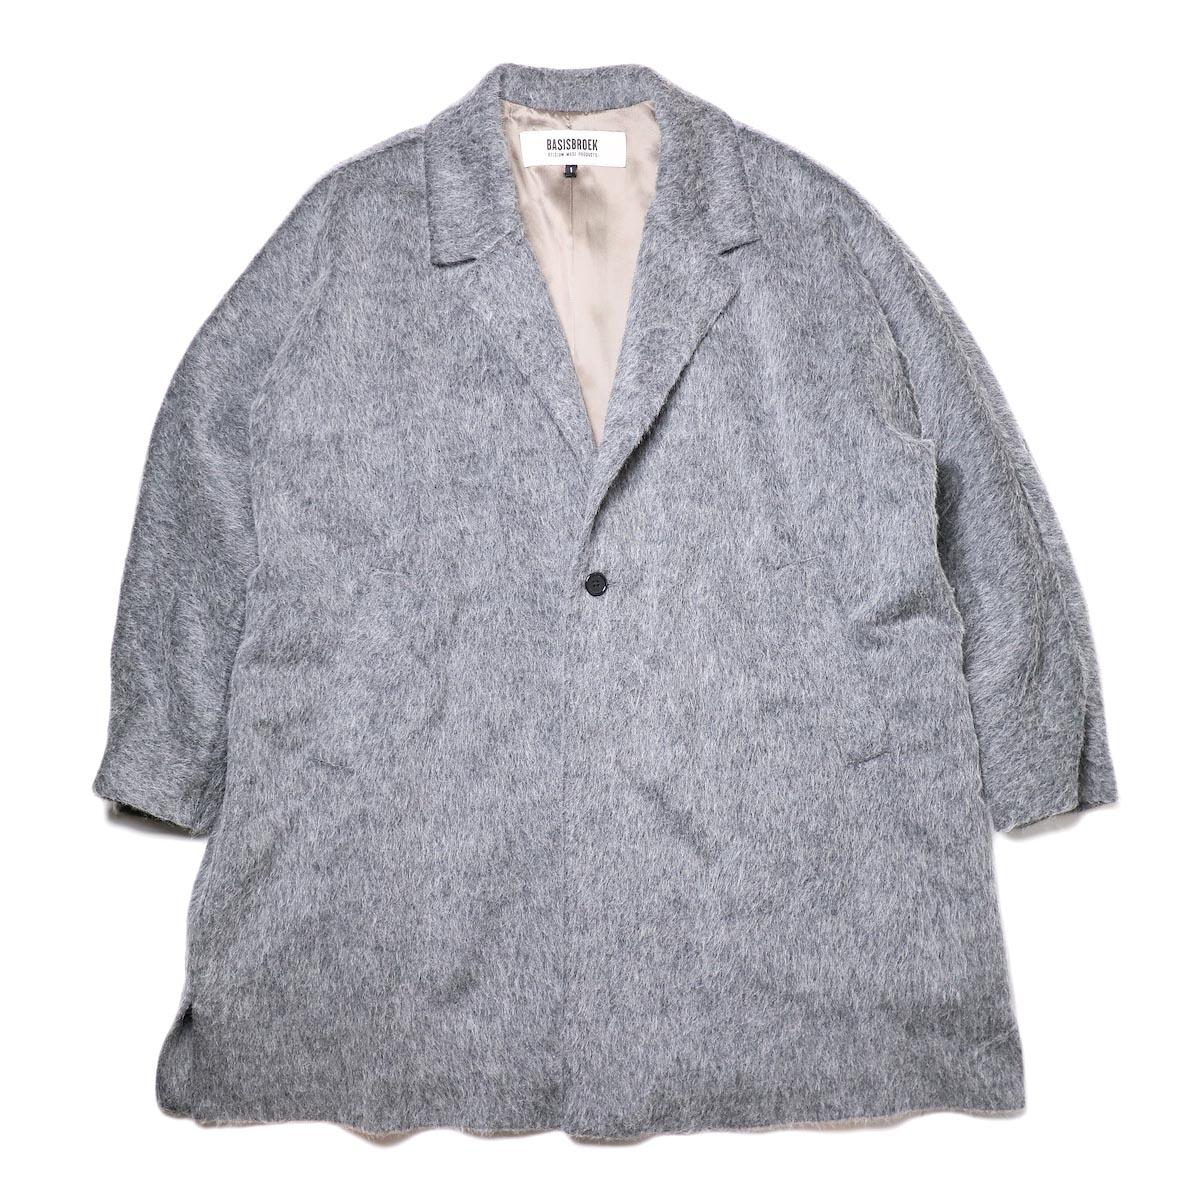 BASISBROEK / RECHT (med grey)